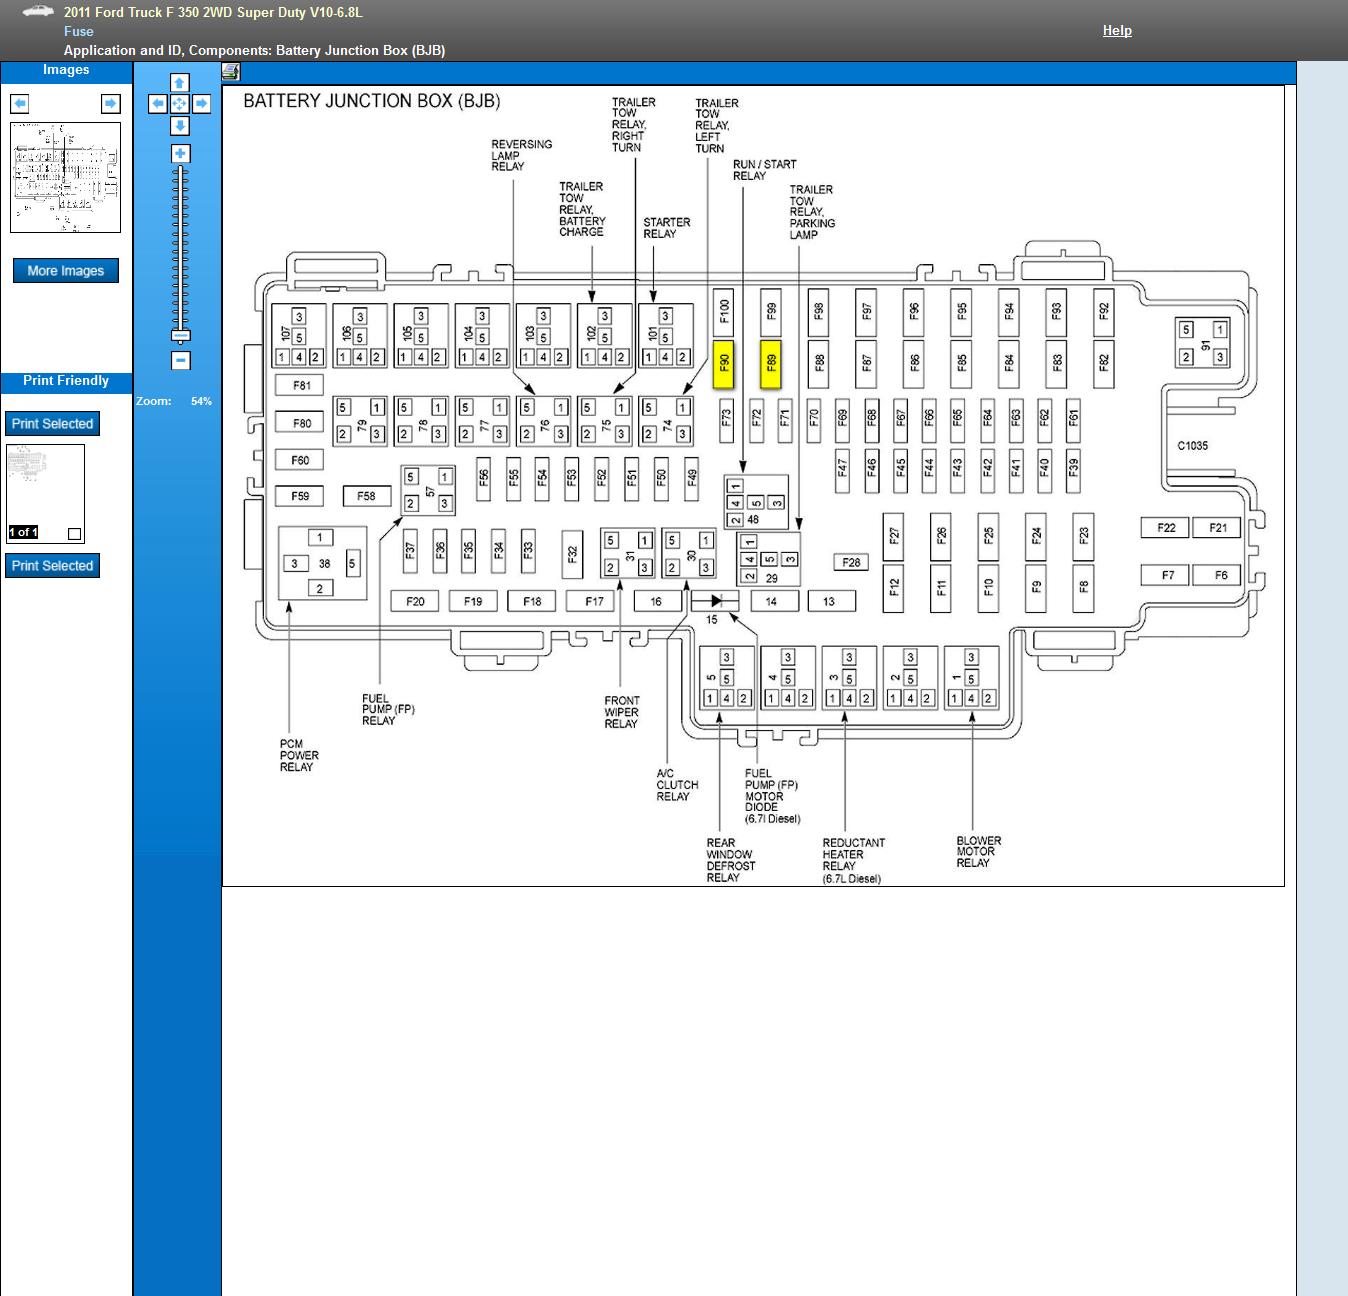 2011 Super Duty Wiring Diagrams